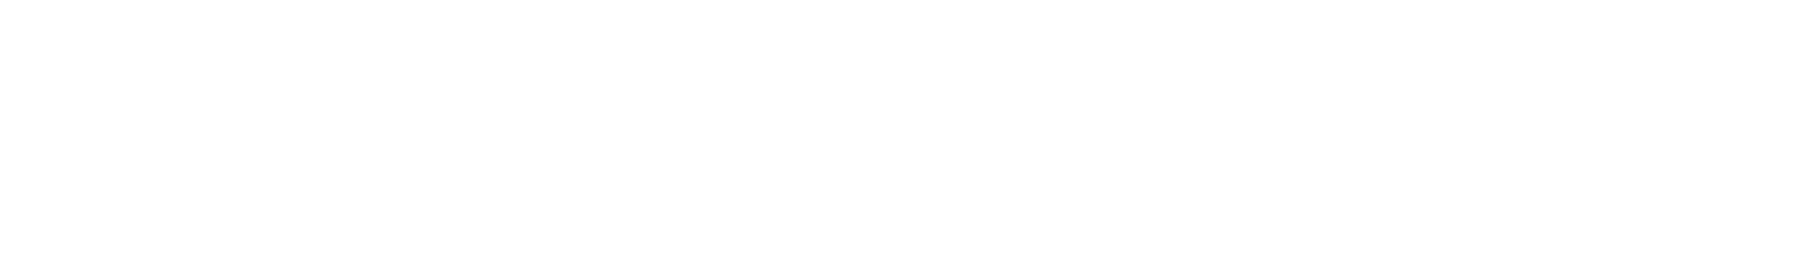 mf rdtf 017 percussion loops 125bpm